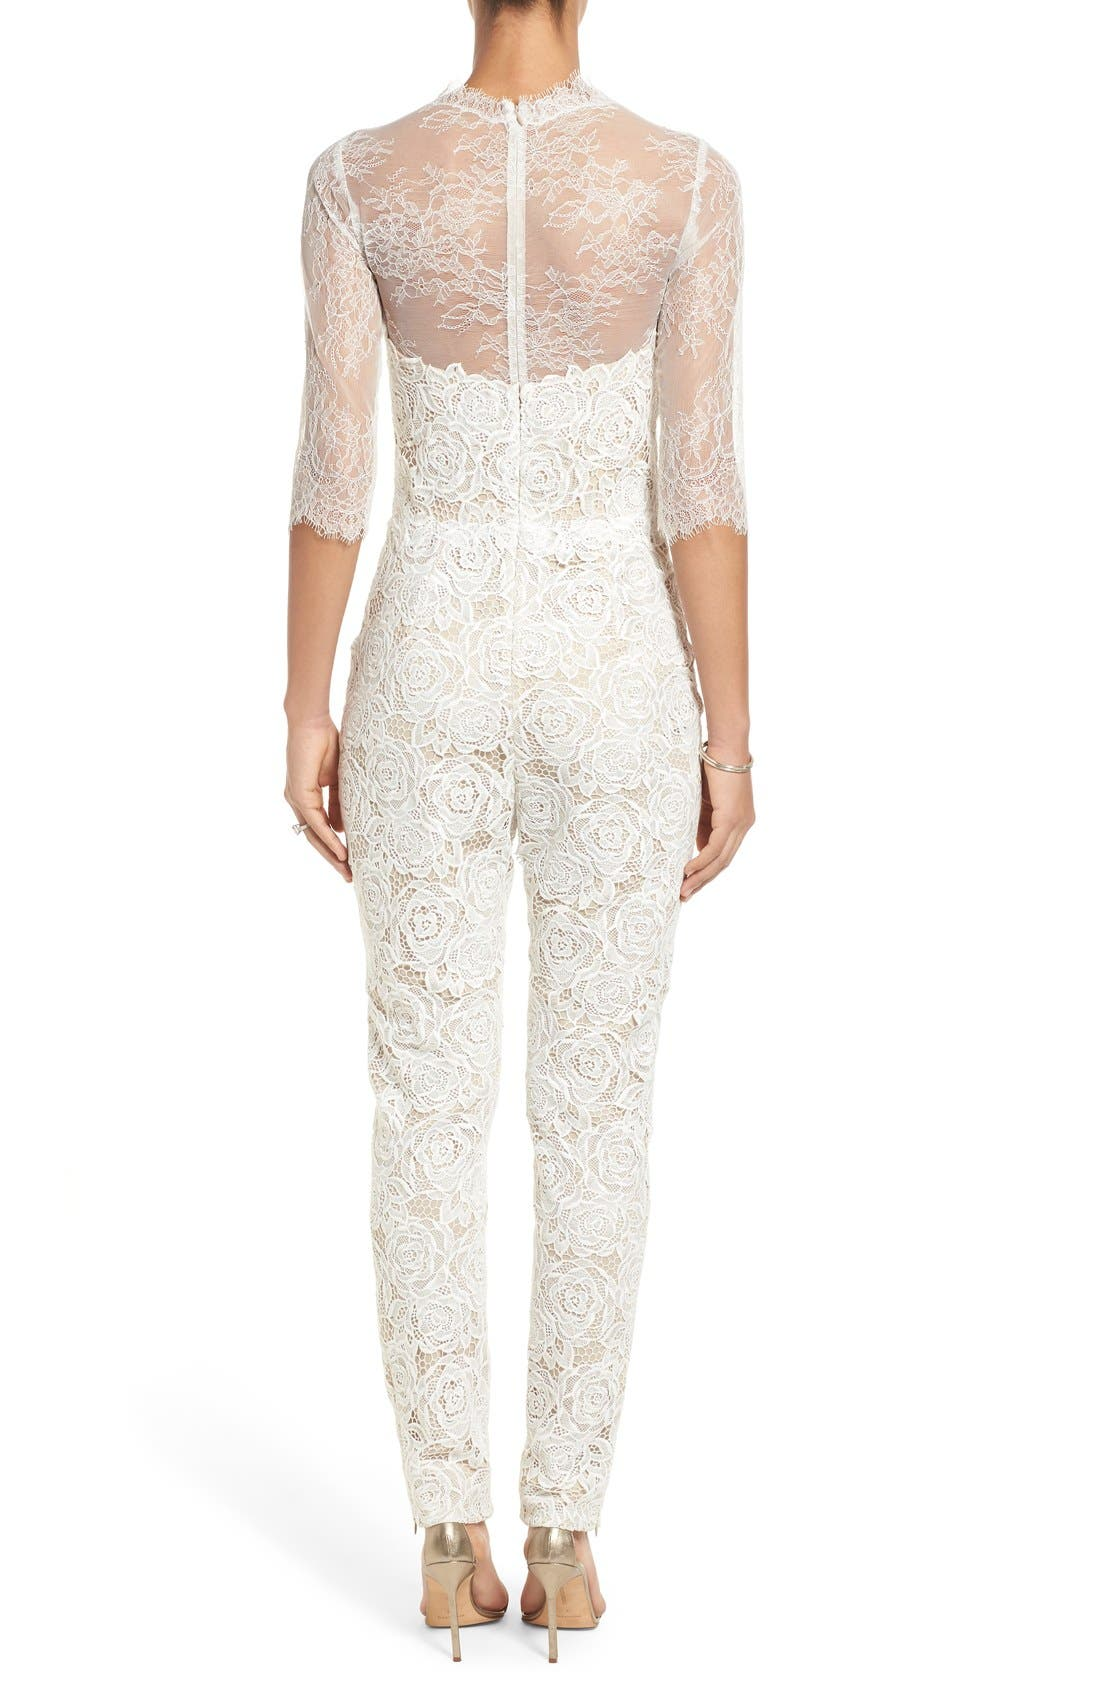 Monique Lhuillier Ready to Wed Guipure Lace Jumpsuit,                             Alternate thumbnail 2, color,                             Silk White/ Nude